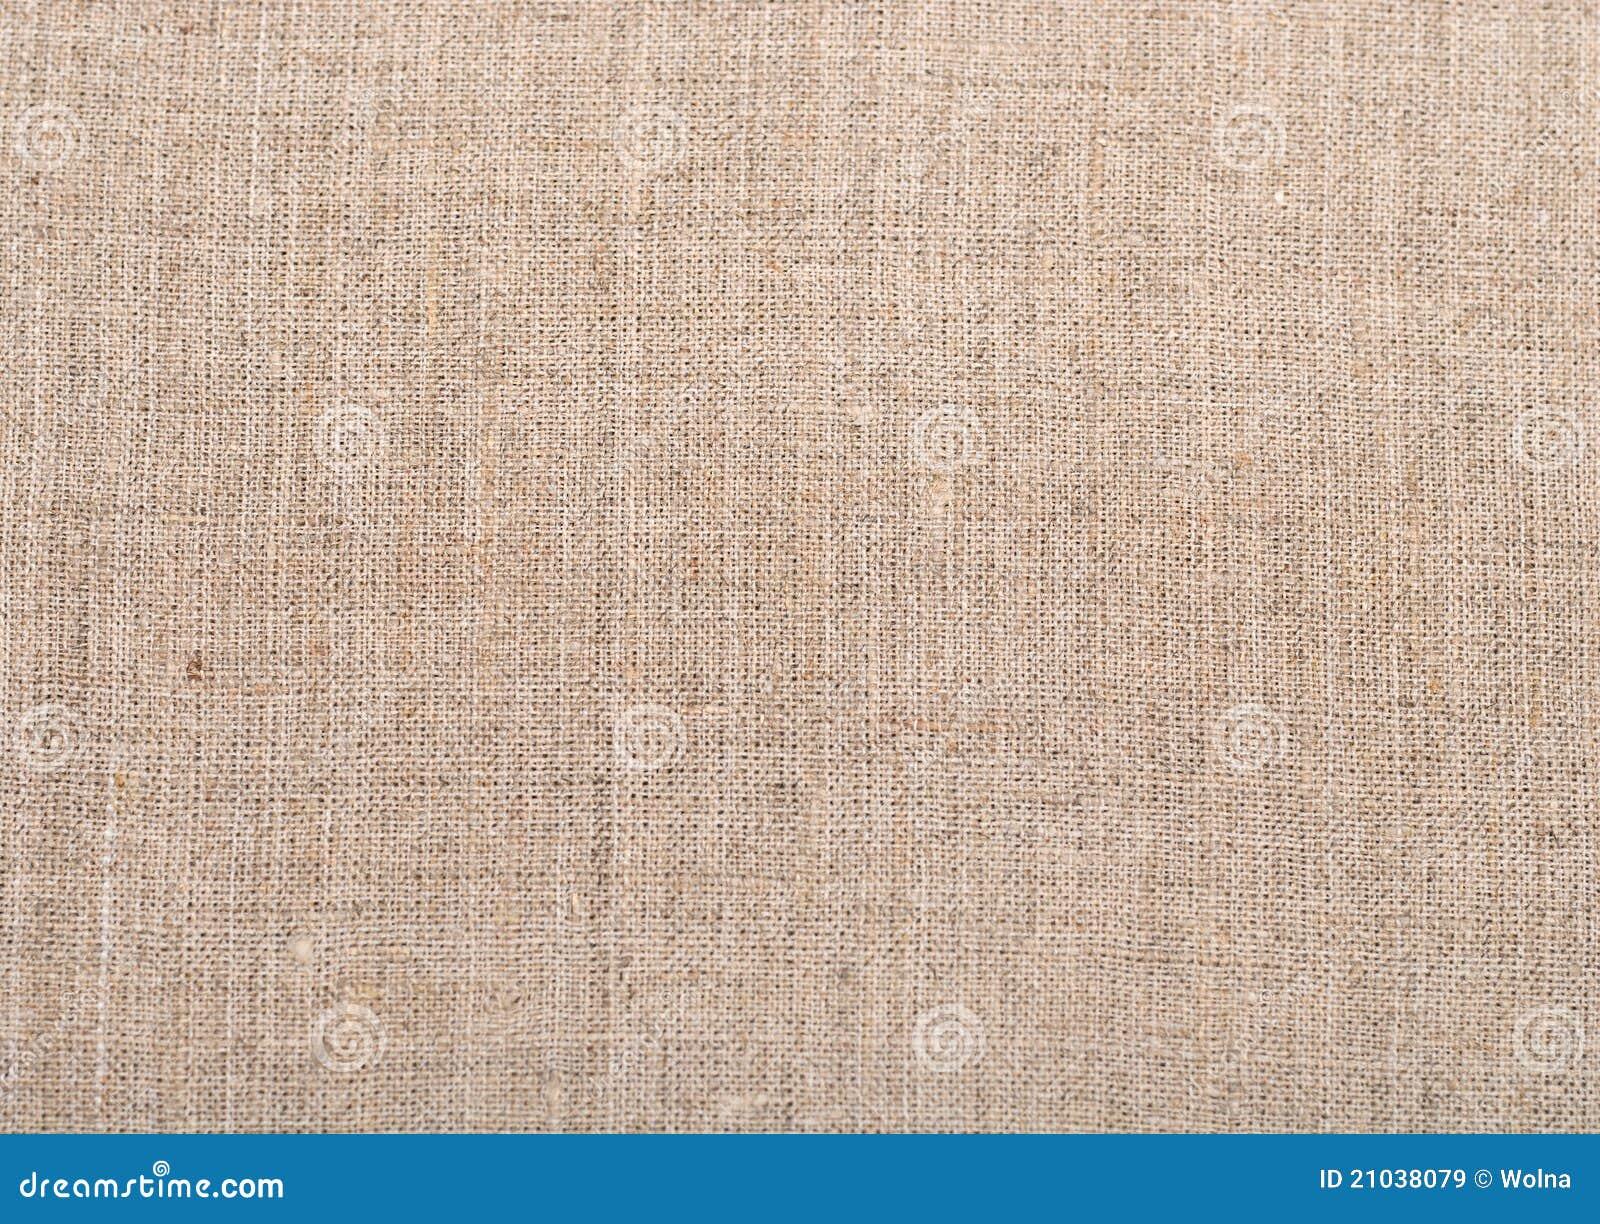 texture de toile de tissu de toile de jute de cru normal. Black Bedroom Furniture Sets. Home Design Ideas